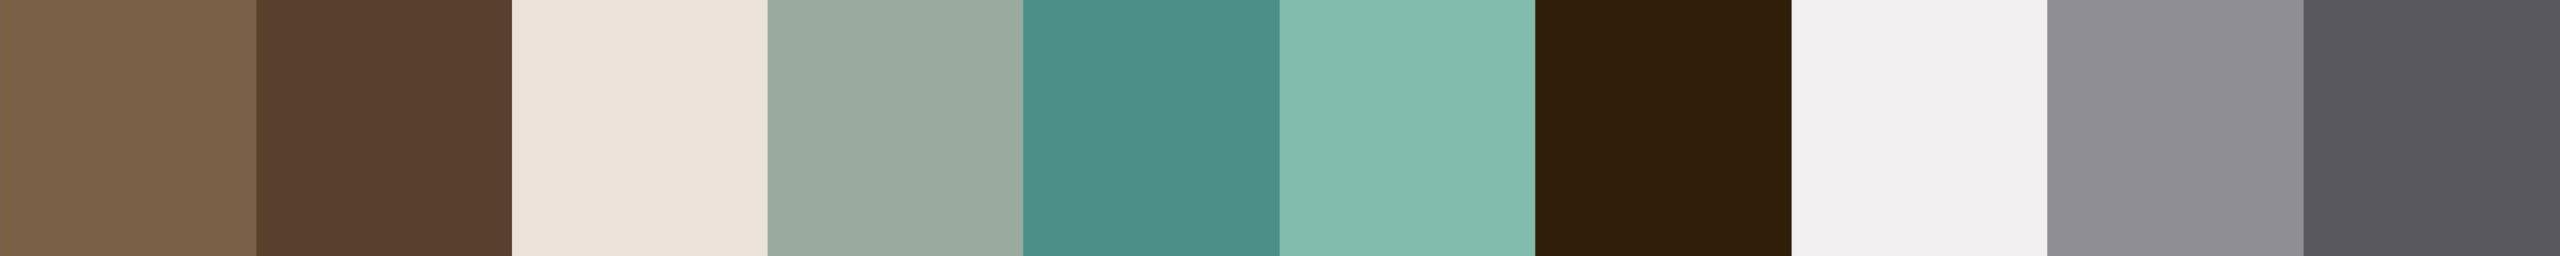 255 Kerniaza Color Palette